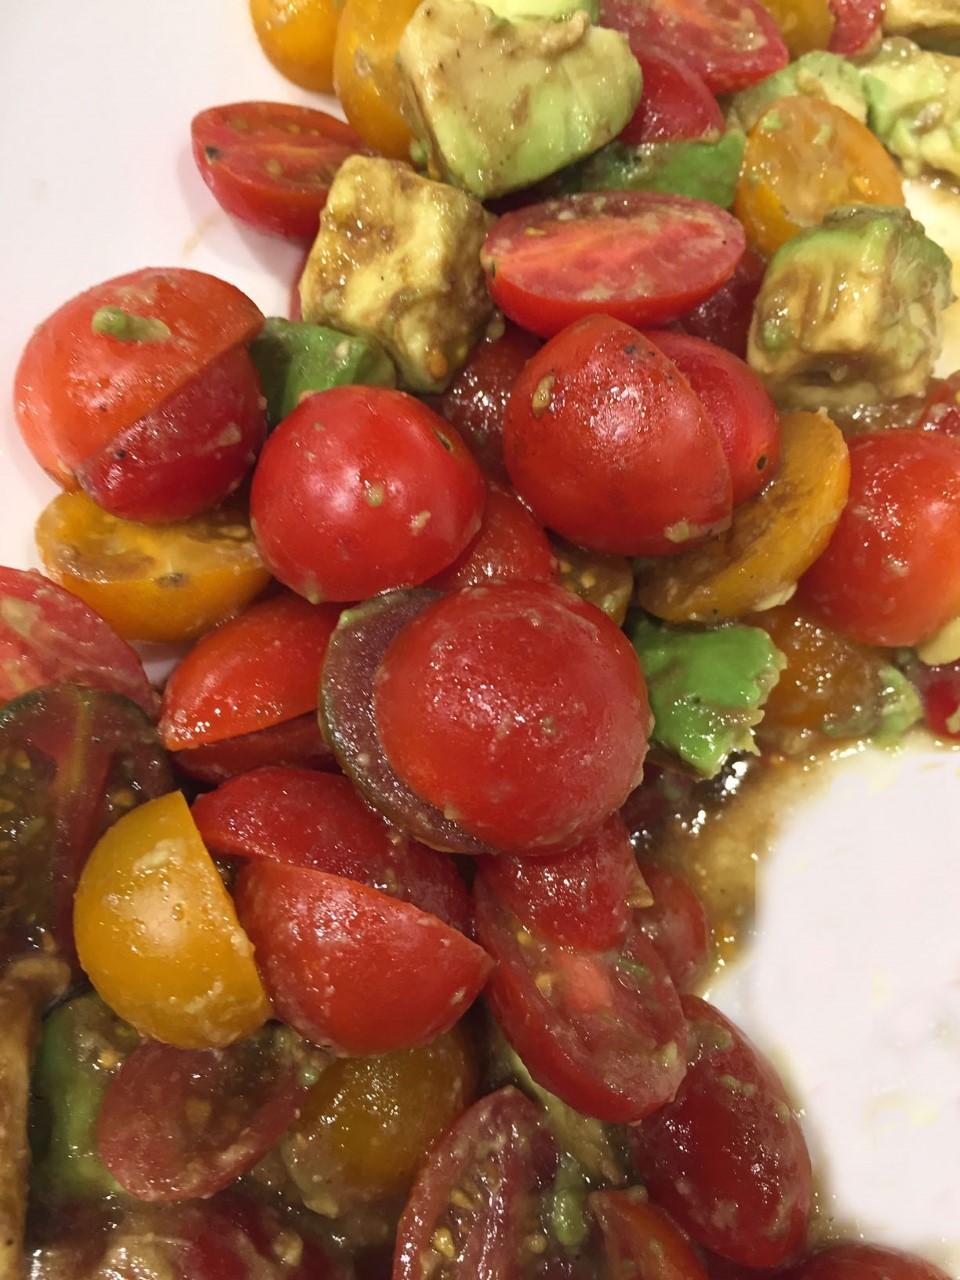 Vegetables for Breakfast – Avocado Tomato Salad